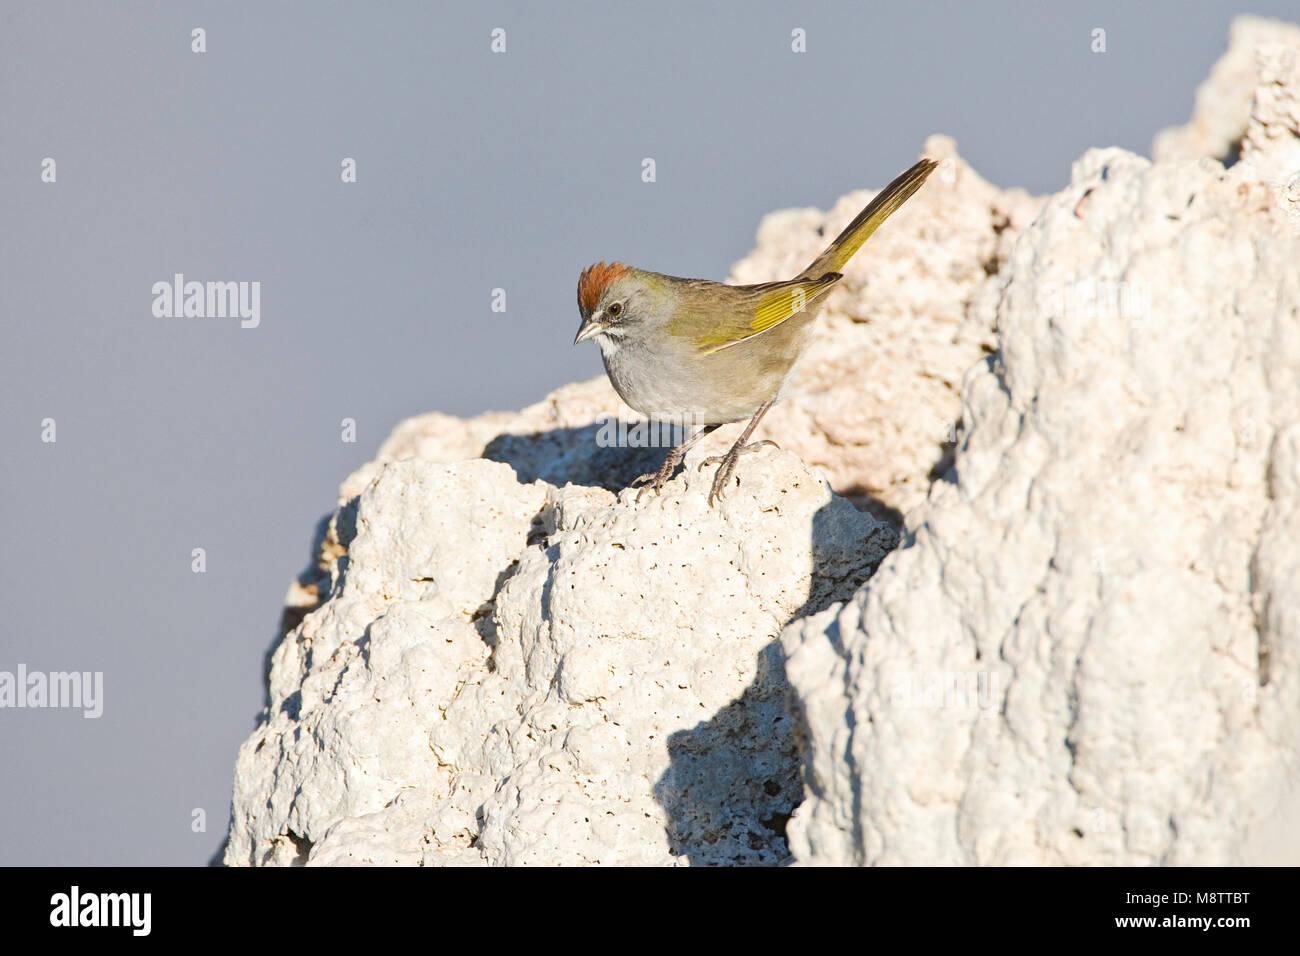 Groenstaarttowie; Green-tailed Towhee - Stock Image